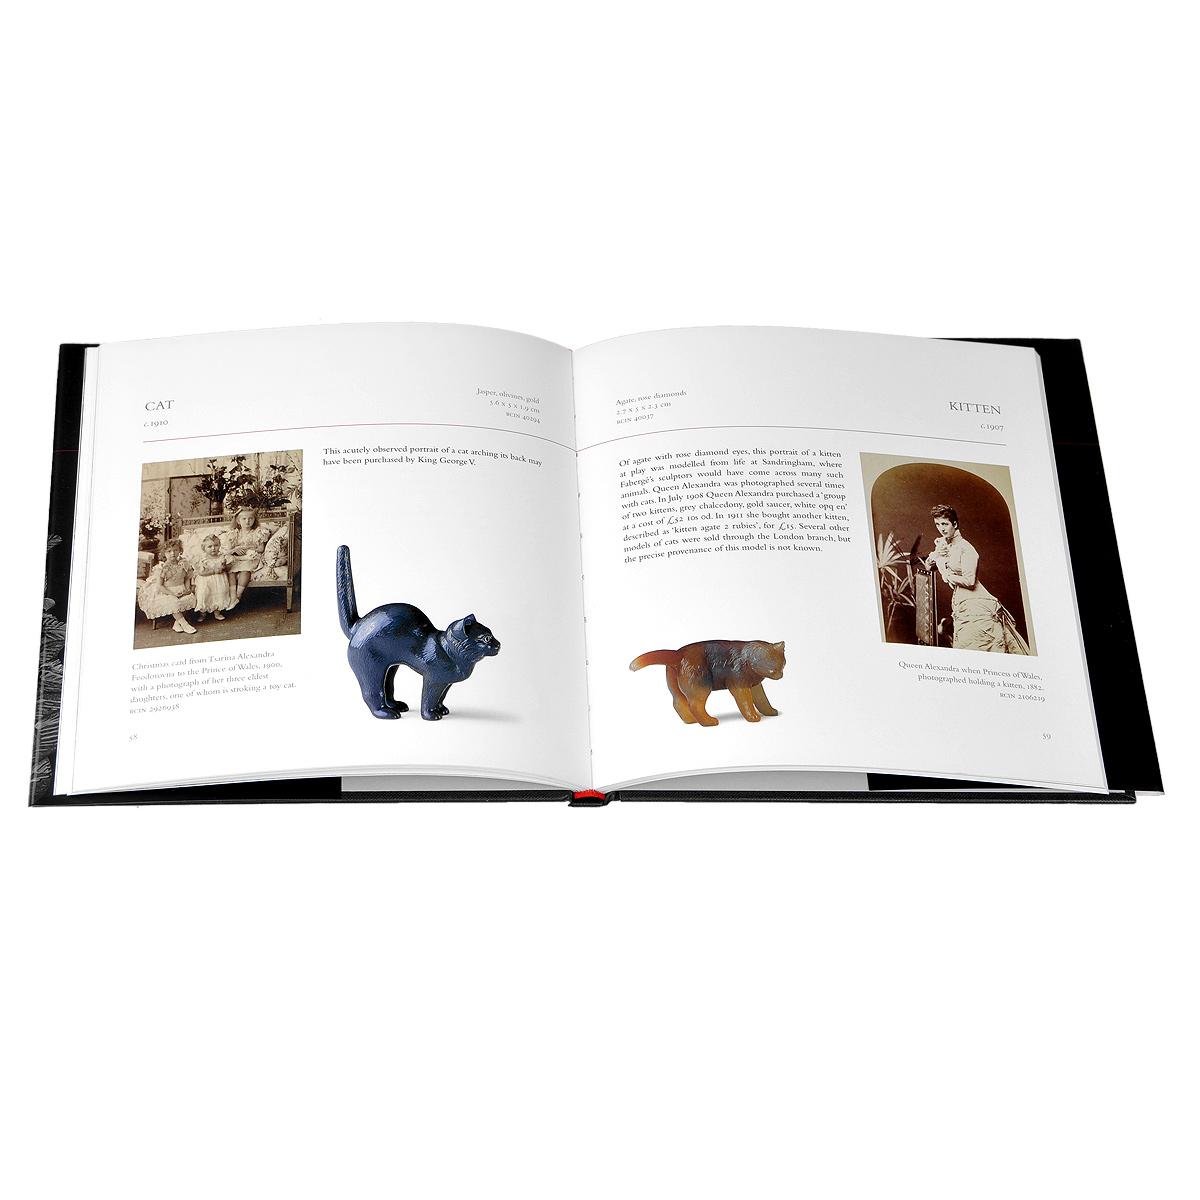 Caroline de Guitaut. Faberge's Animals: A Royal Farm in Miniature